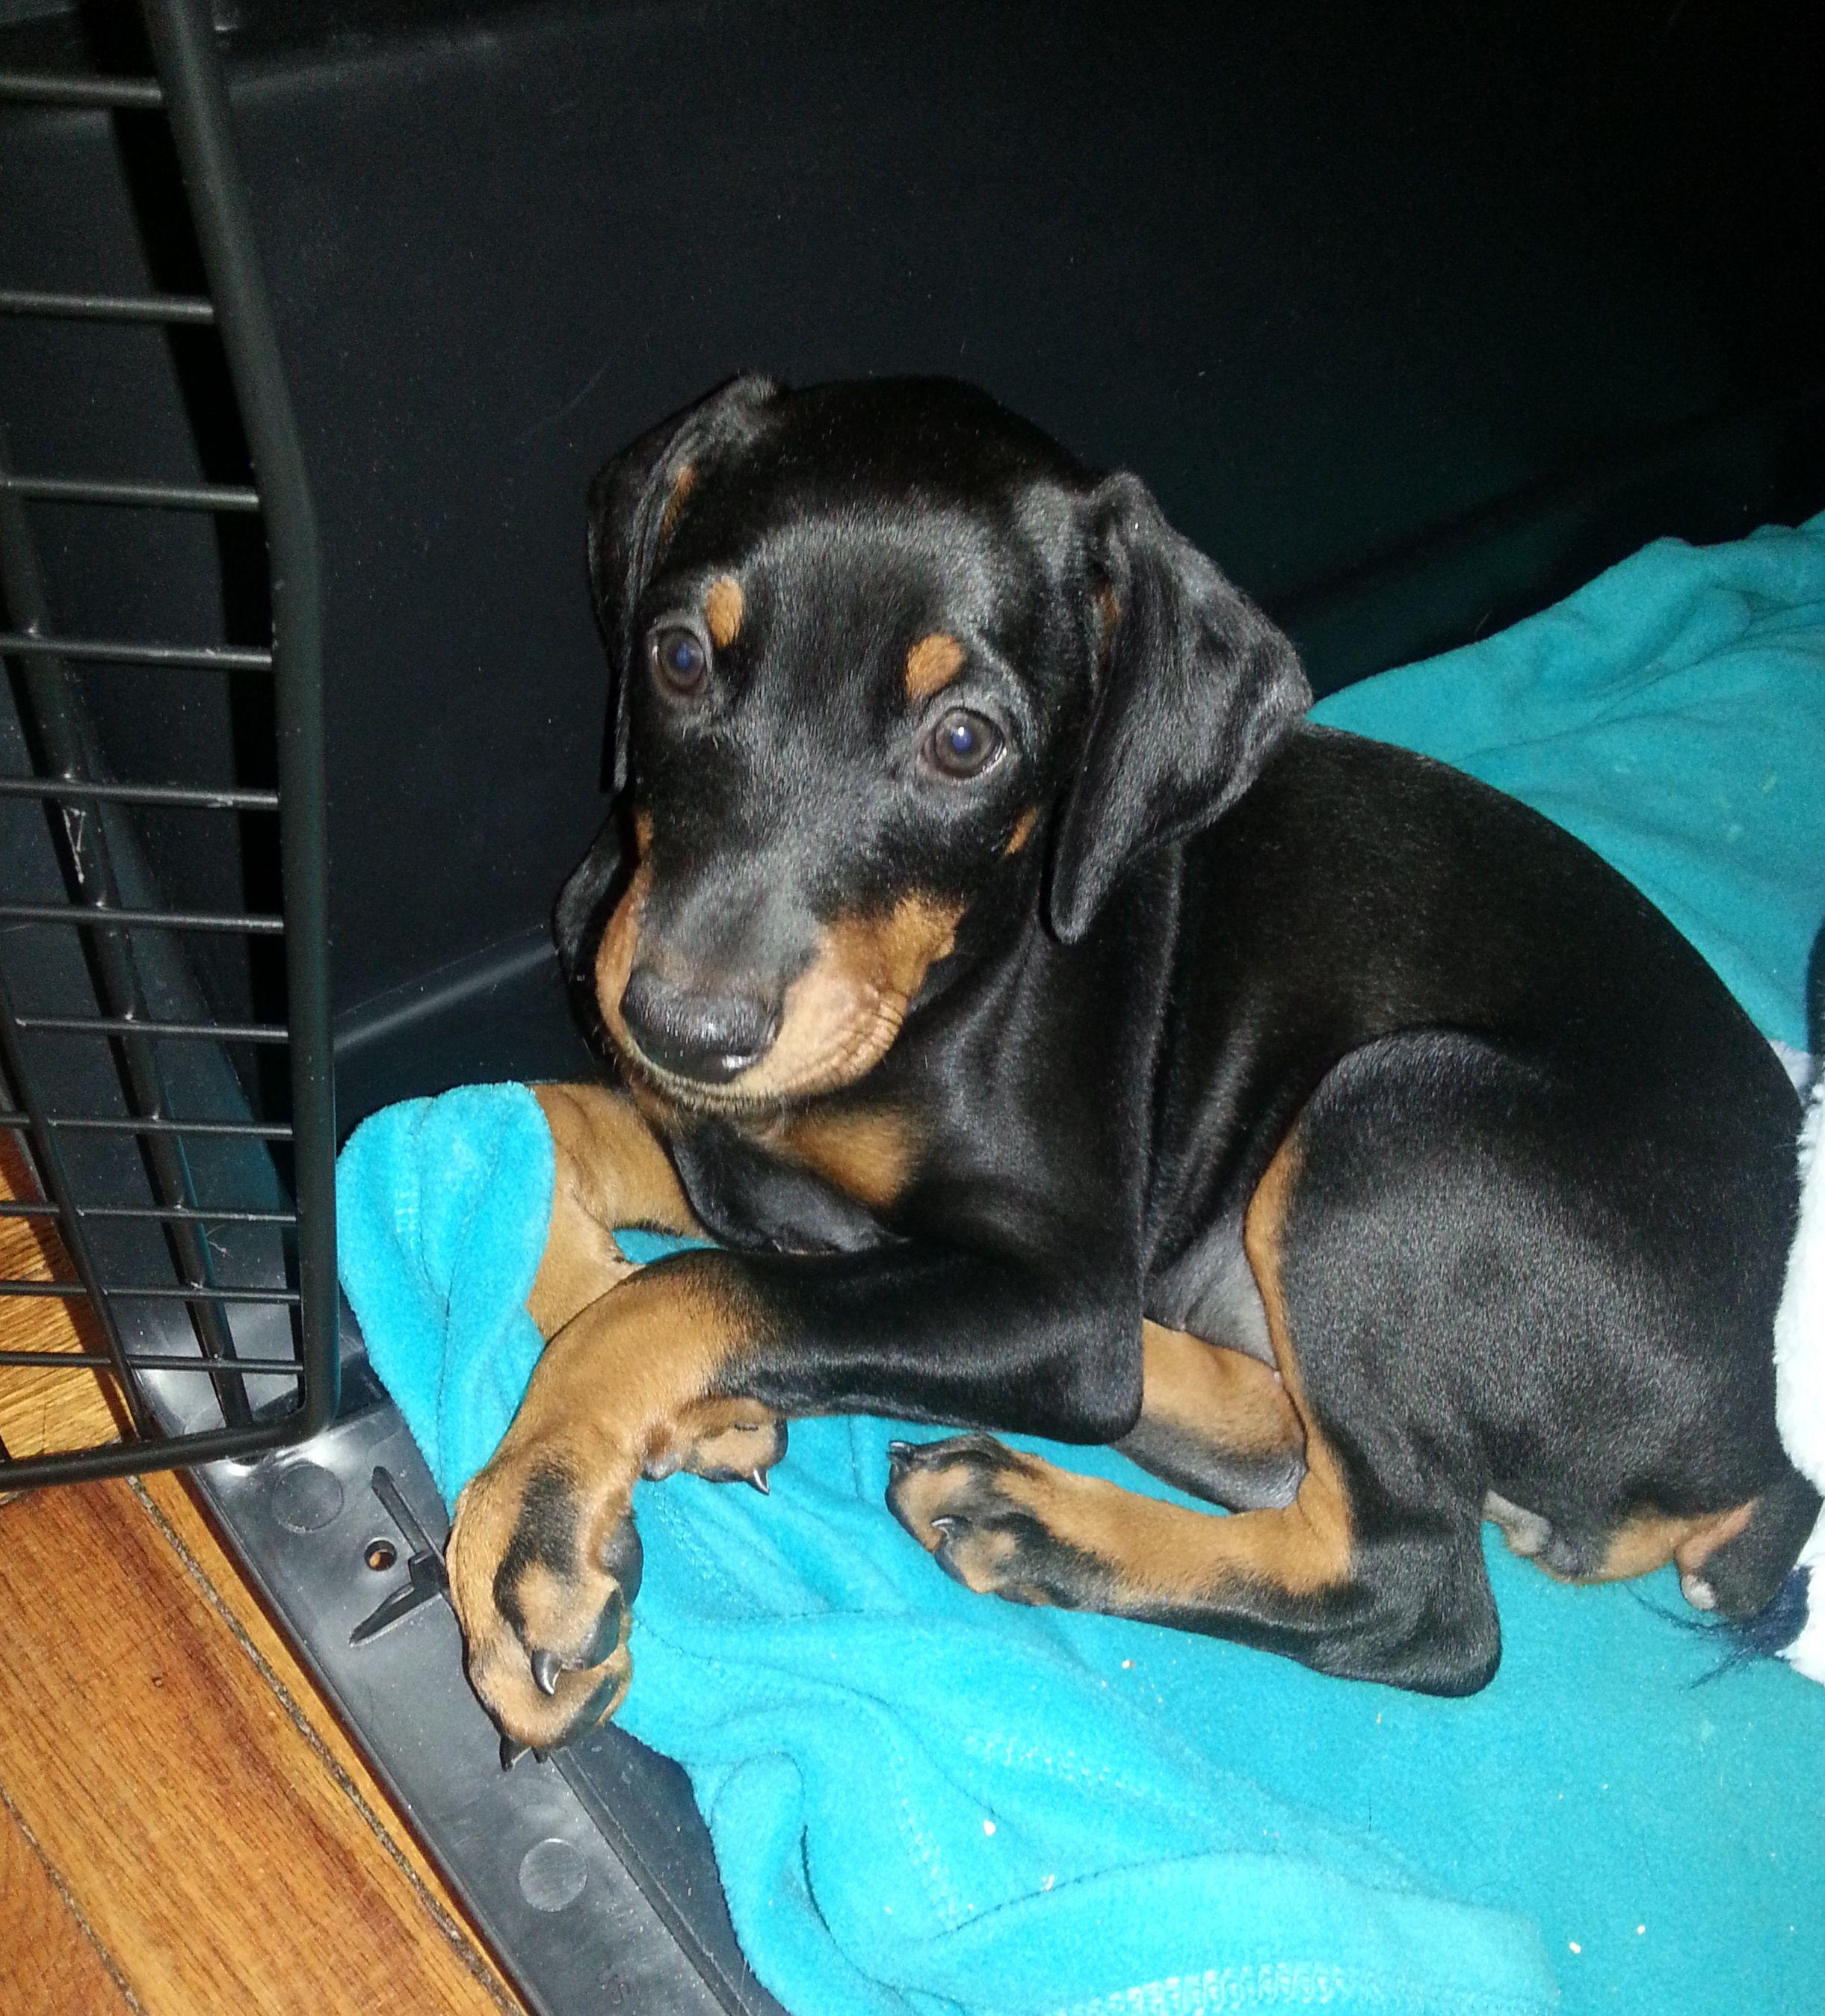 1st Day Home In Nj 7 Weeks Old Doberman Pinscher Puppy Doberman